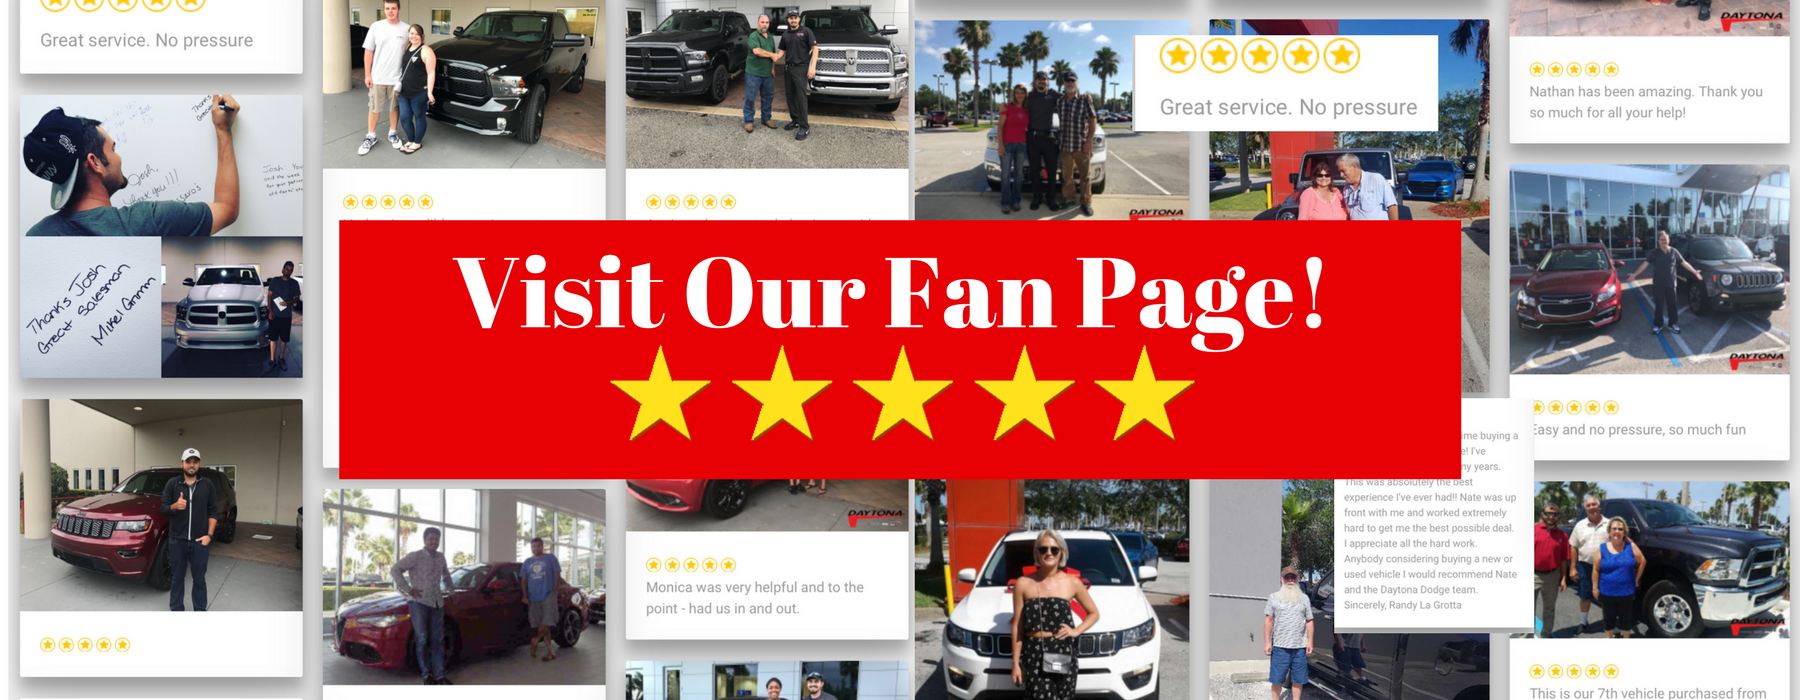 CB Fan page visit